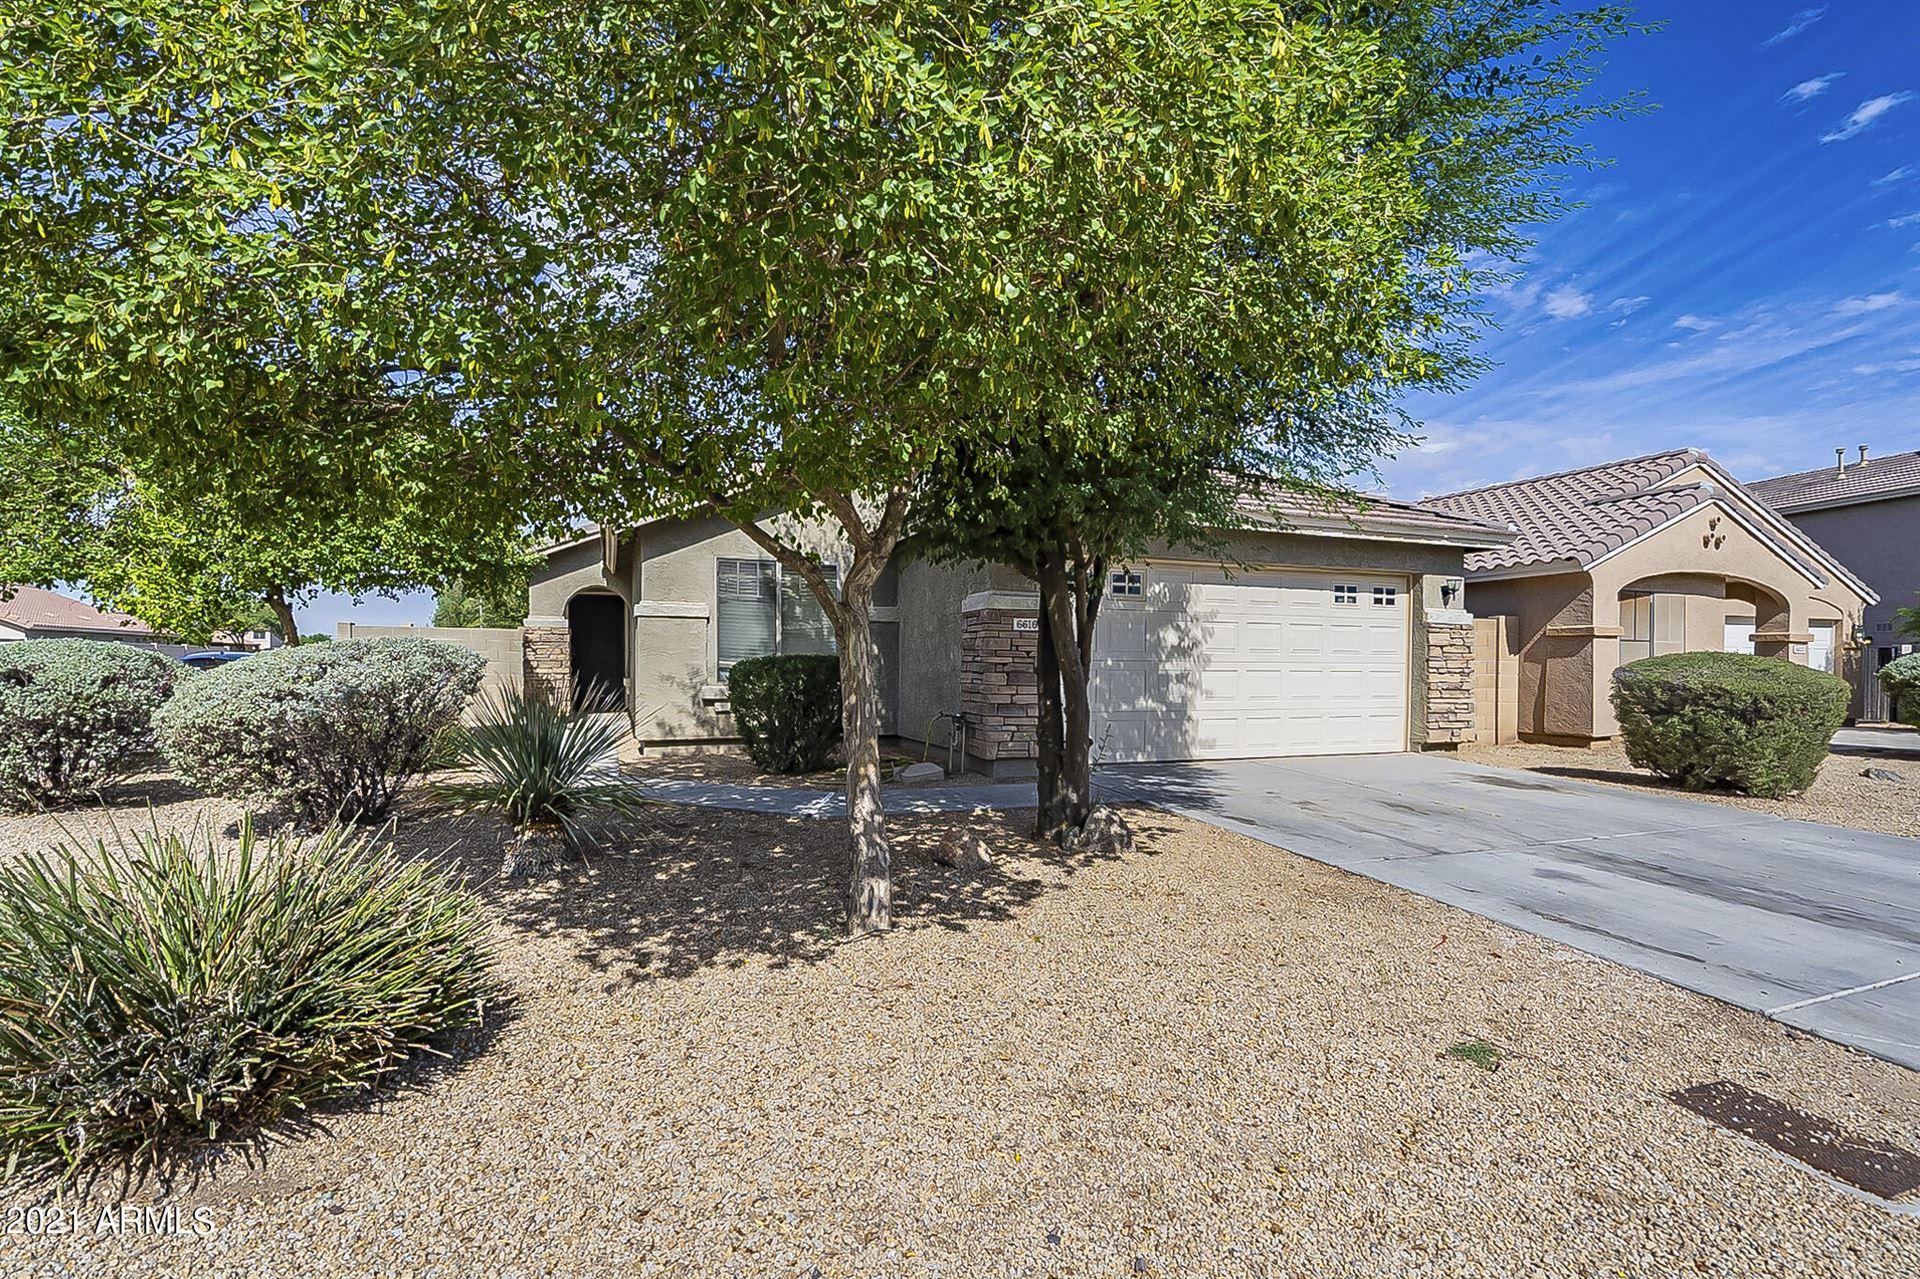 Photo of 6616 W DESERT Lane, Laveen, AZ 85339 (MLS # 6306037)